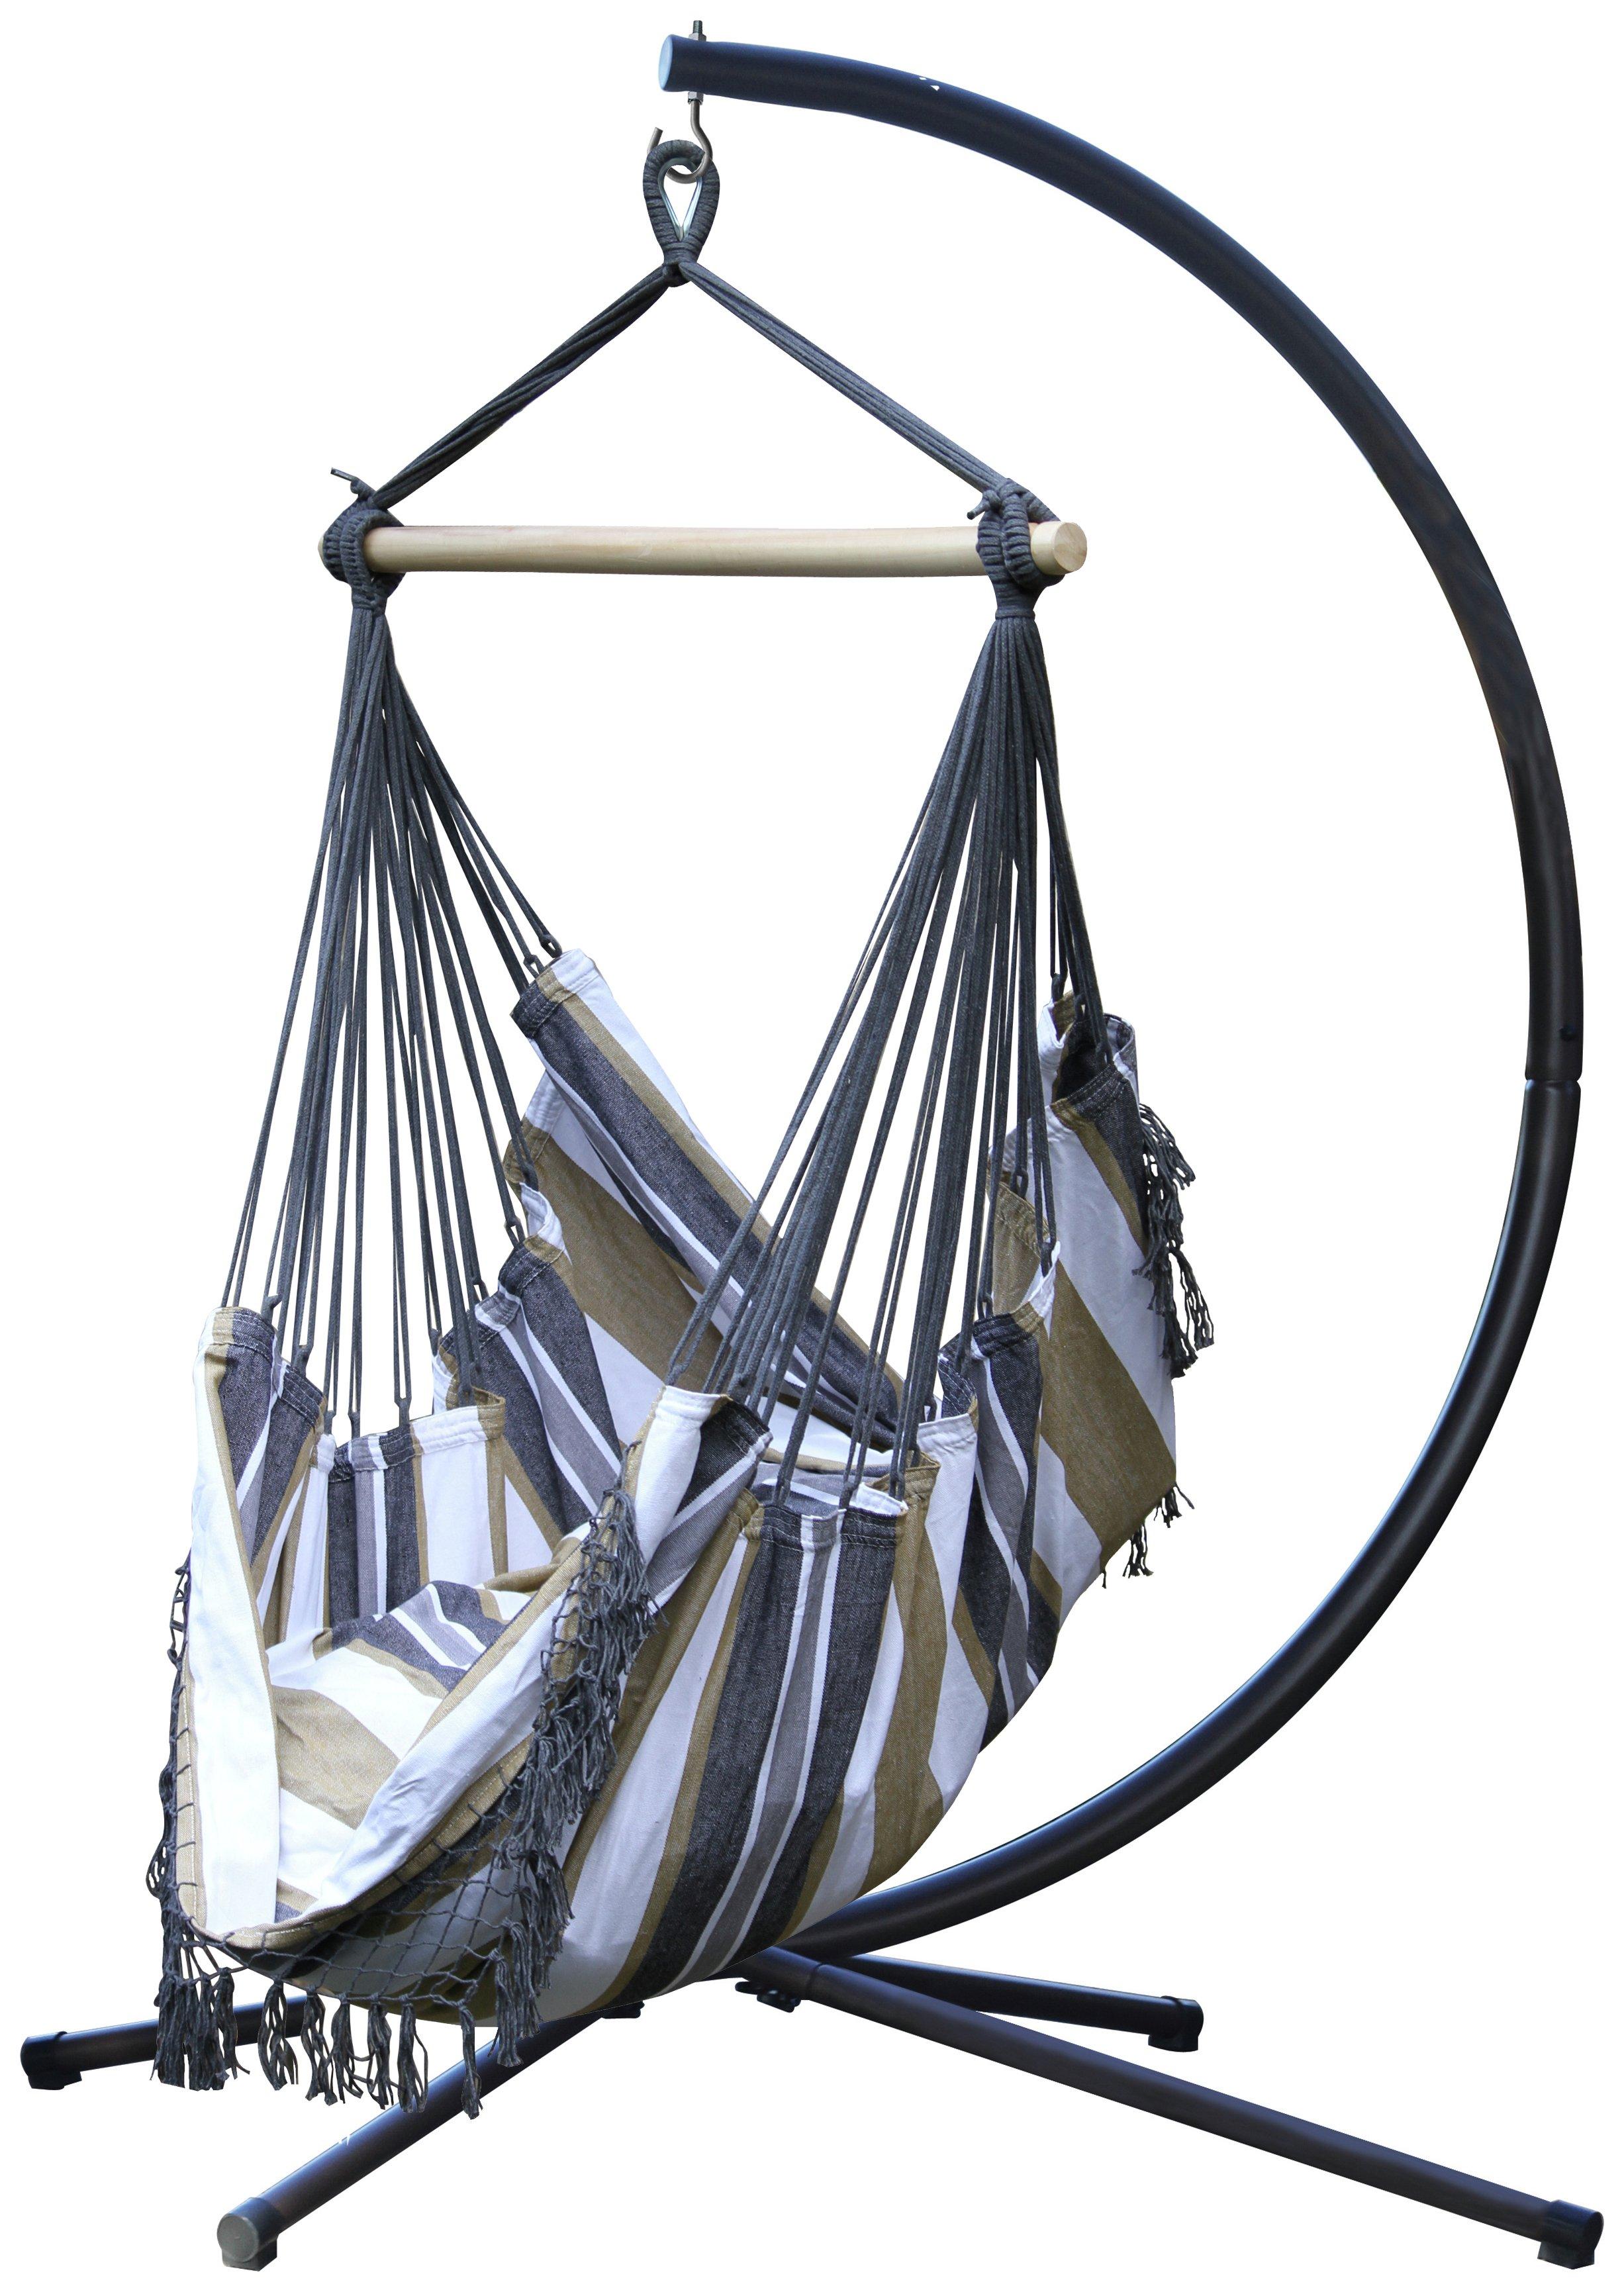 Vivere Brazil Hammock Chair with Stand - Desert Moon